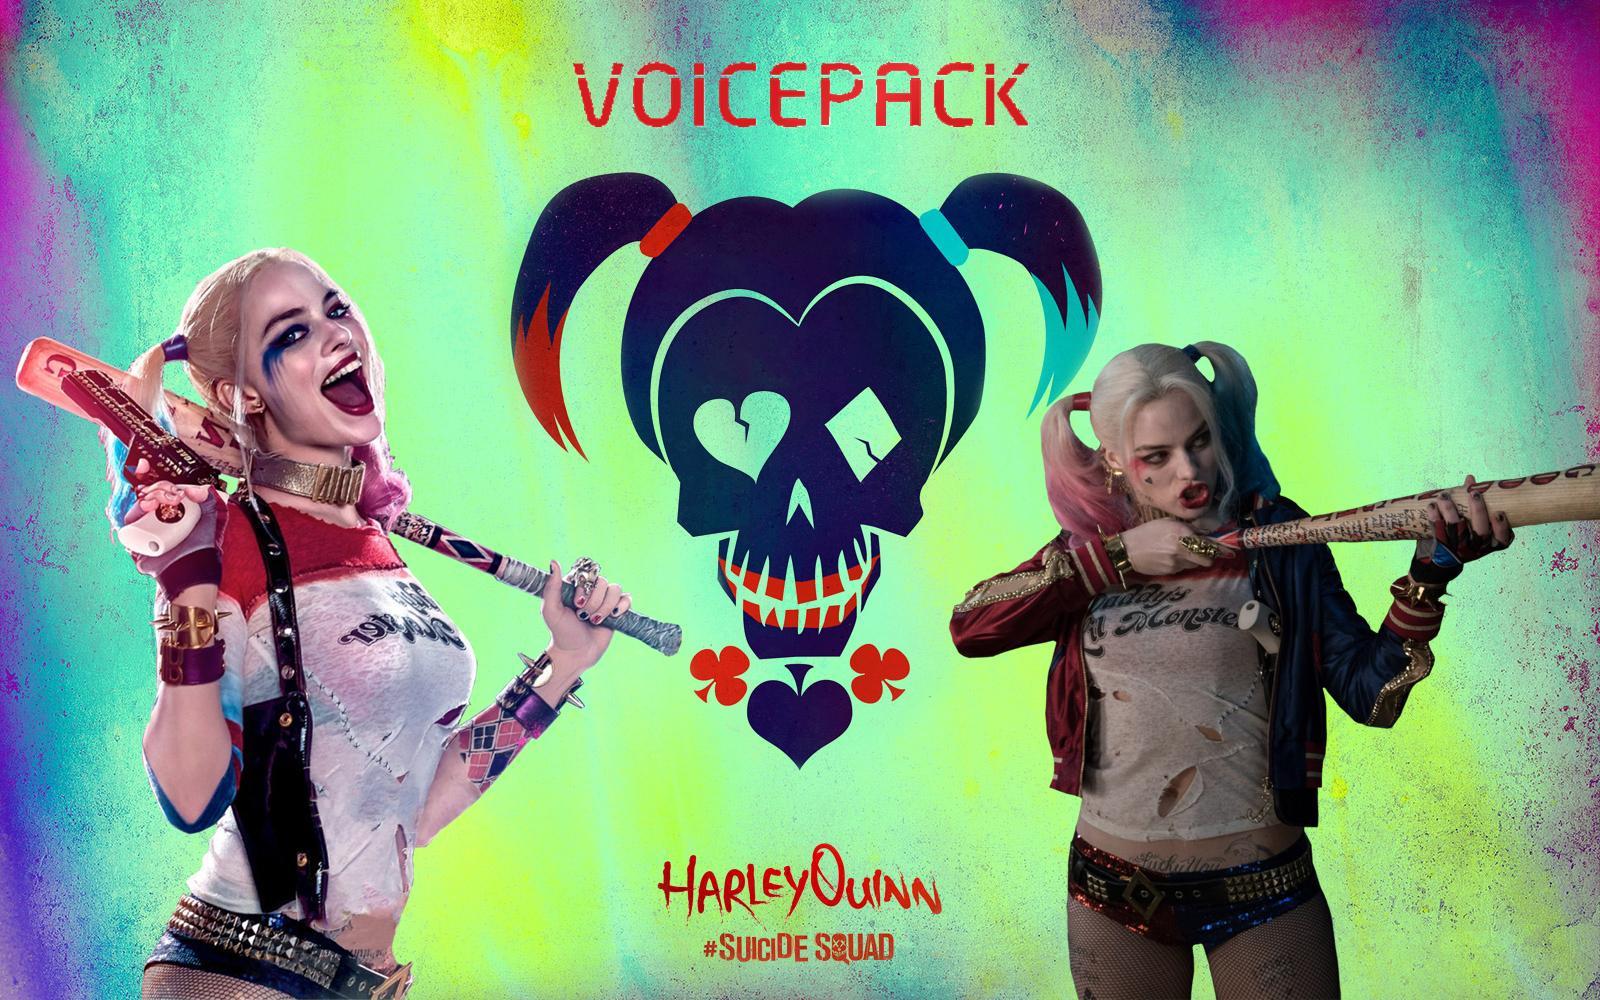 Harley Quinn Suicide Squad Voice Pack - GTA5-Mods.com